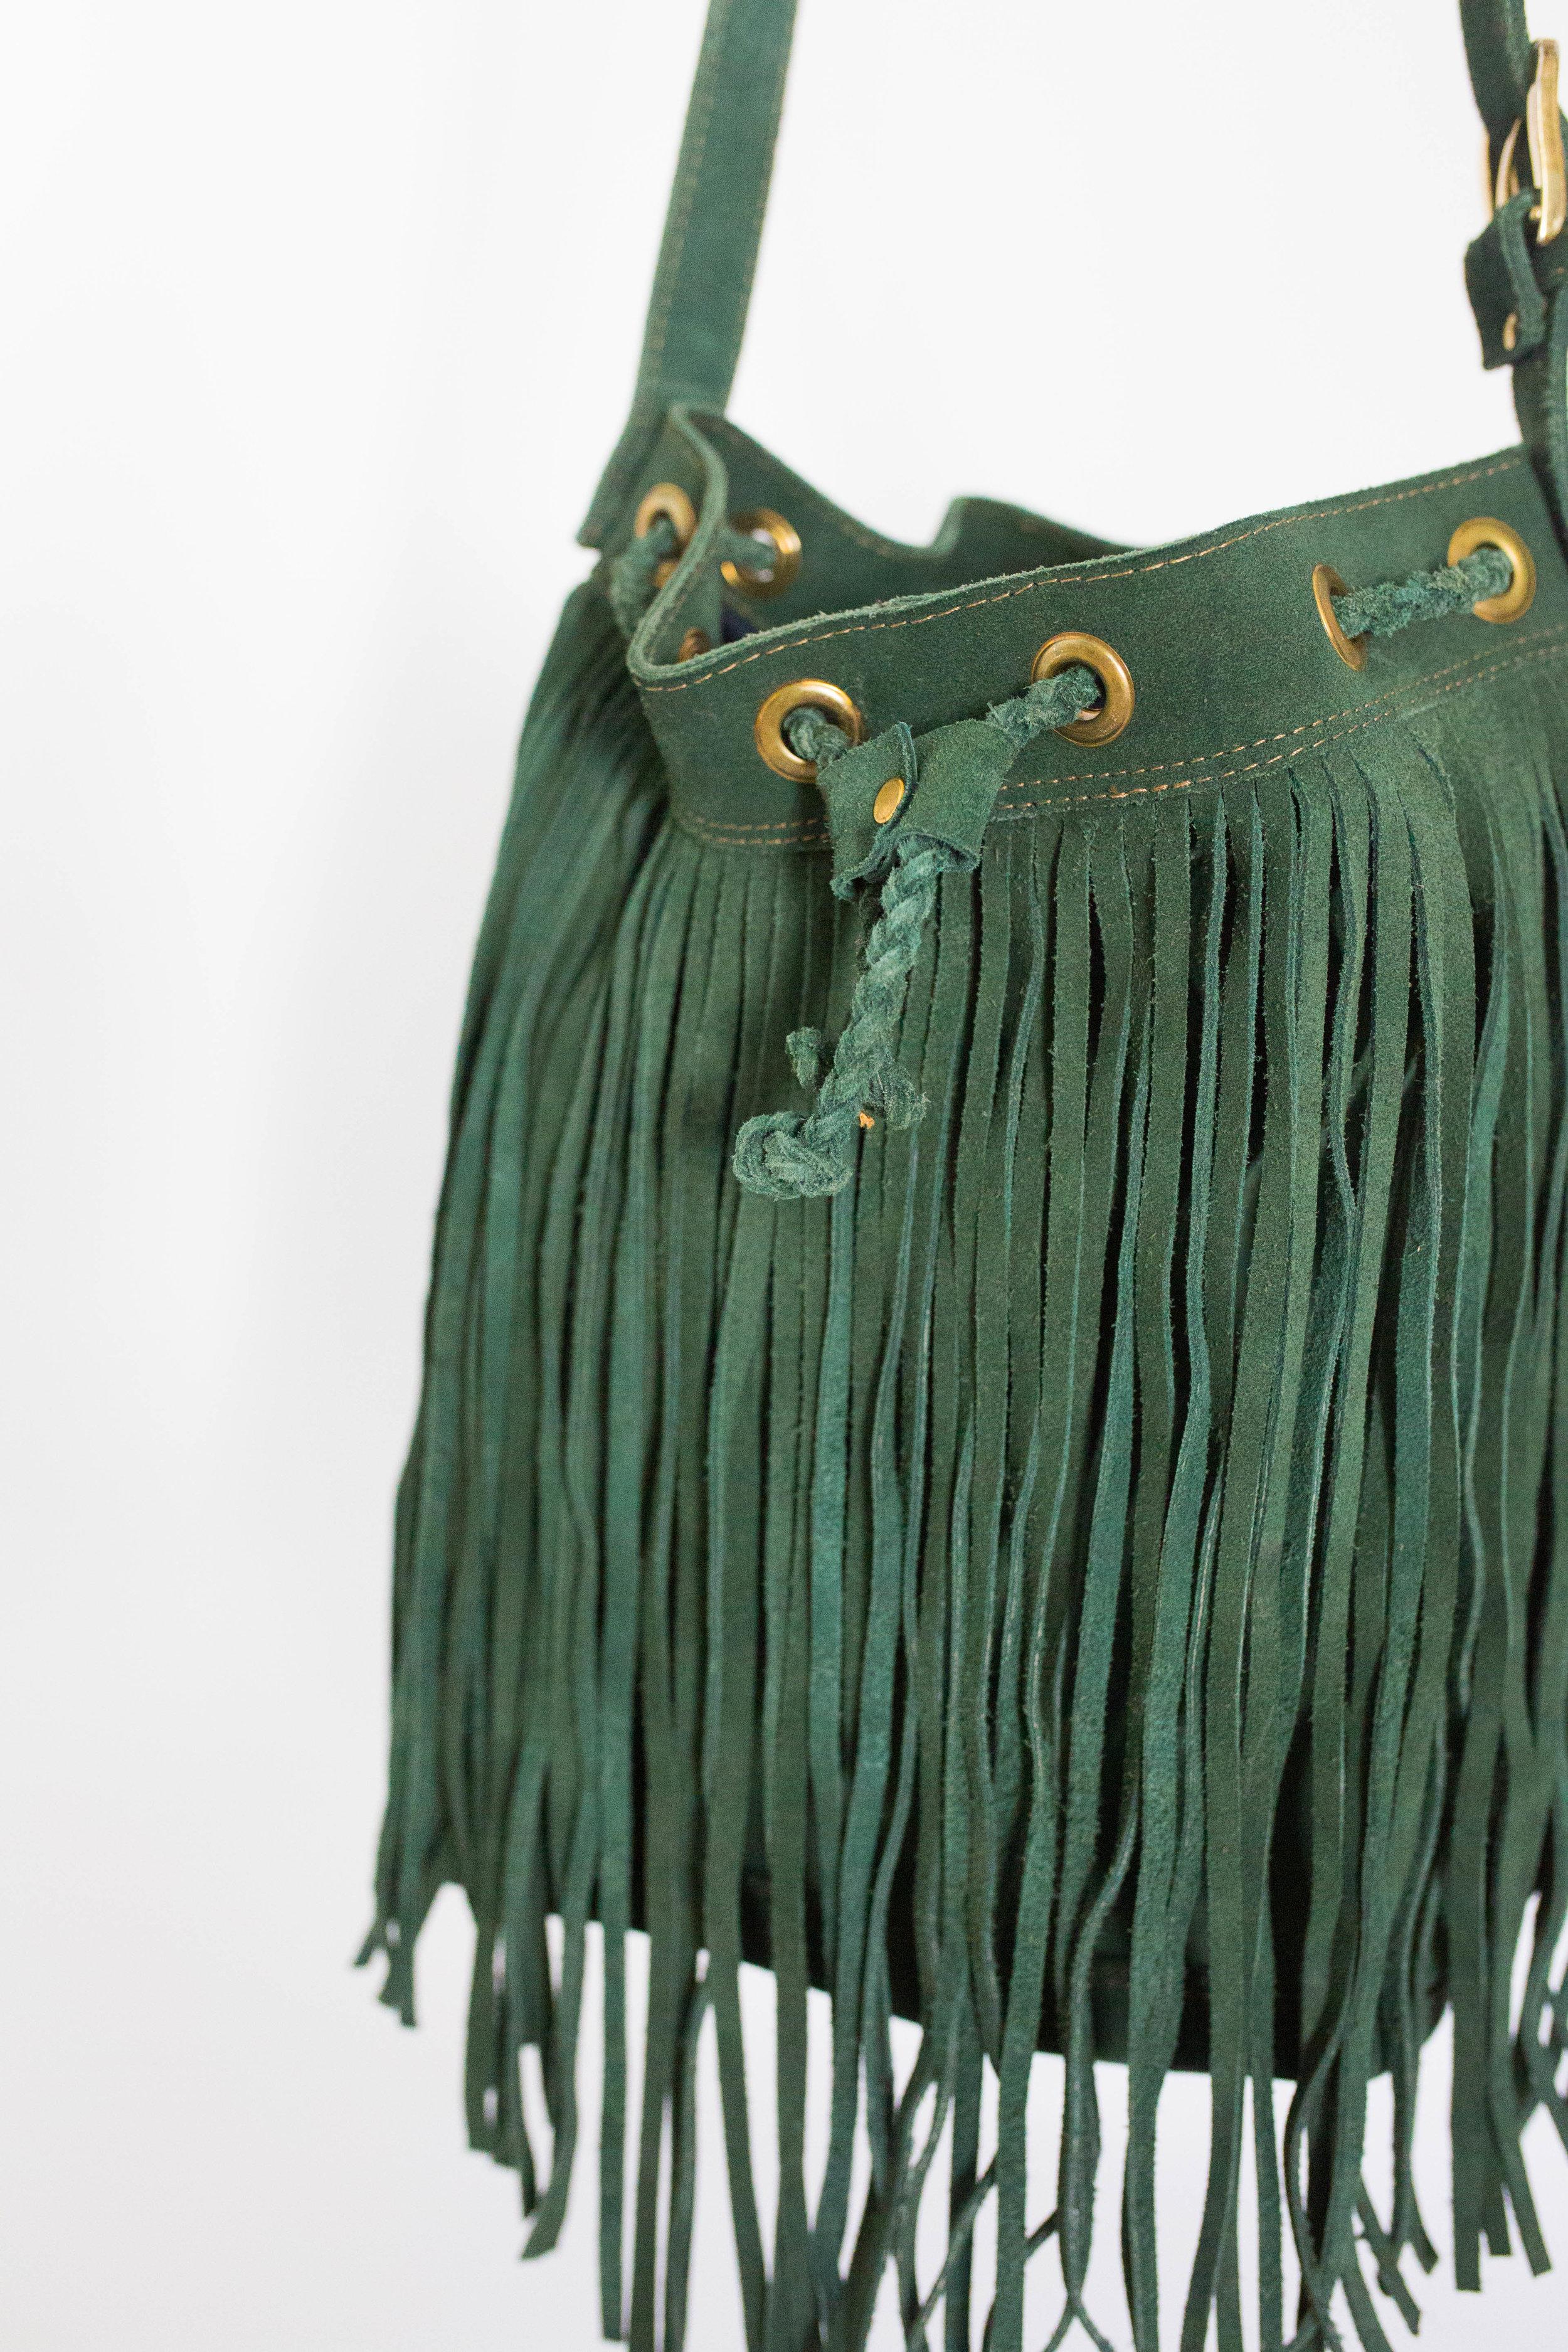 Hazlo Handmade Guatemala Fair Trade Hand Woven Leather Bags Accessories Belts Antigua Slow Fashion Purse Jewelry1779.jpg